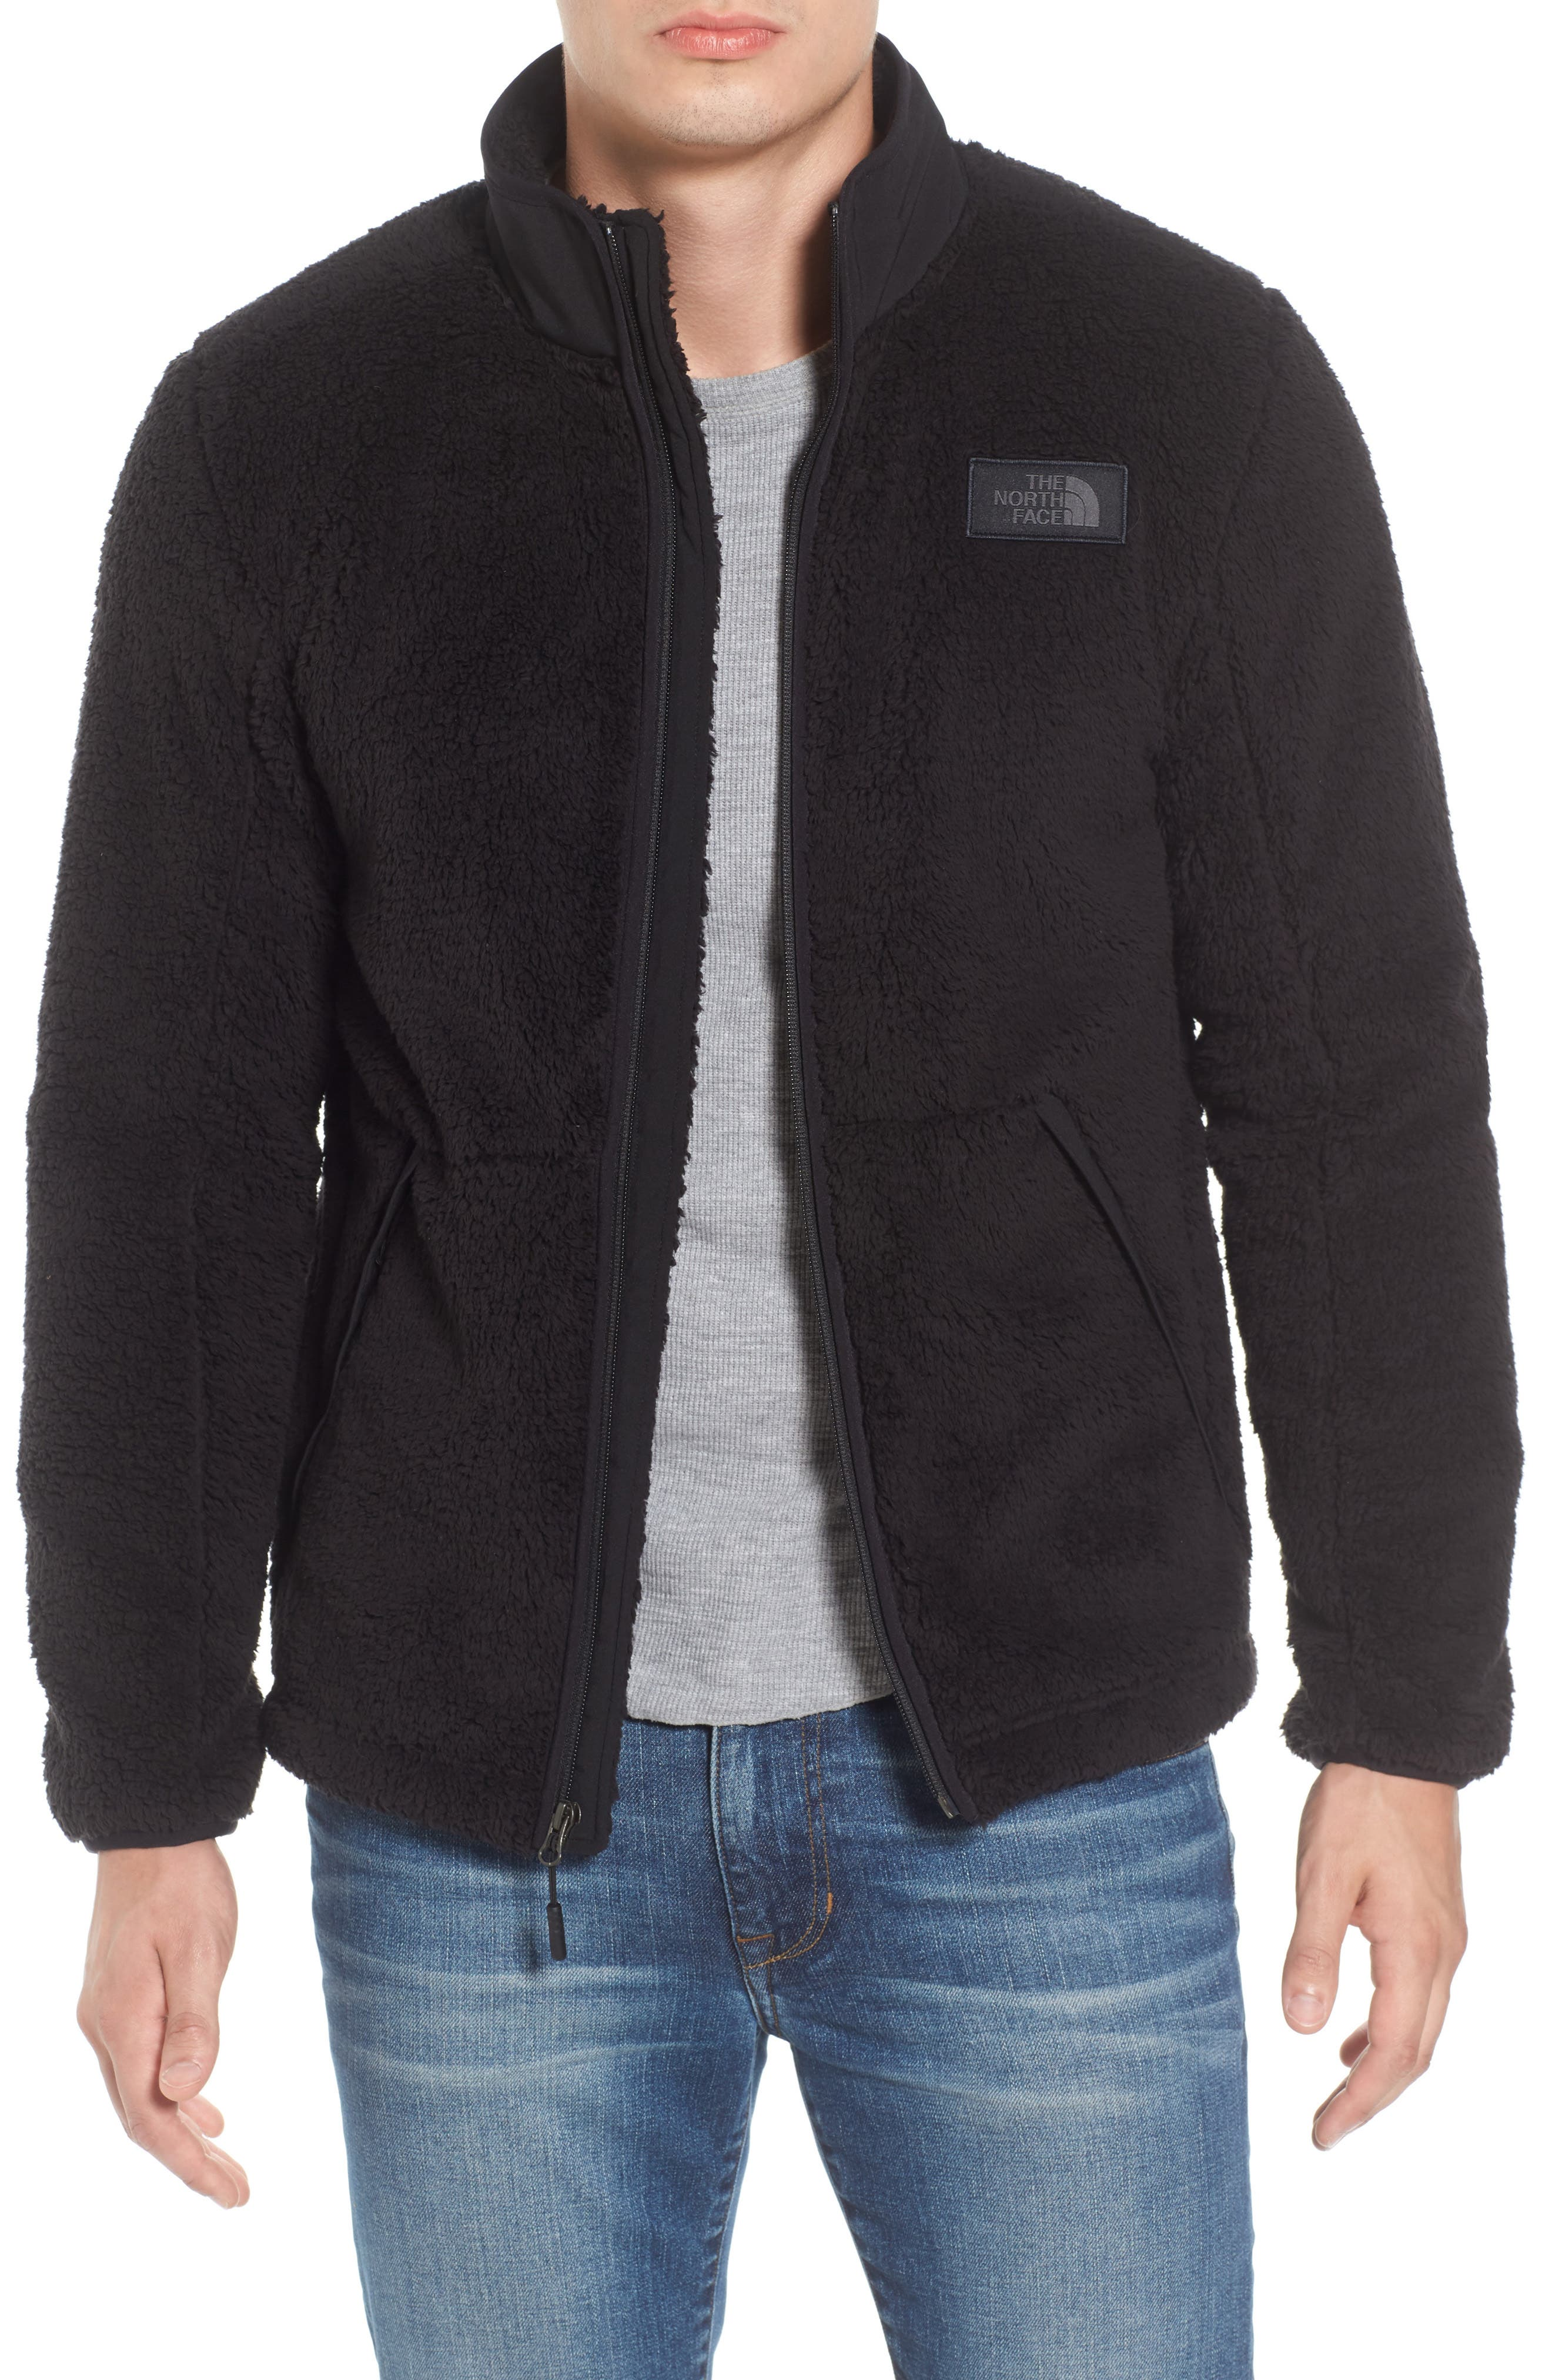 Campshire Zip Fleece Jacket,                         Main,                         color,